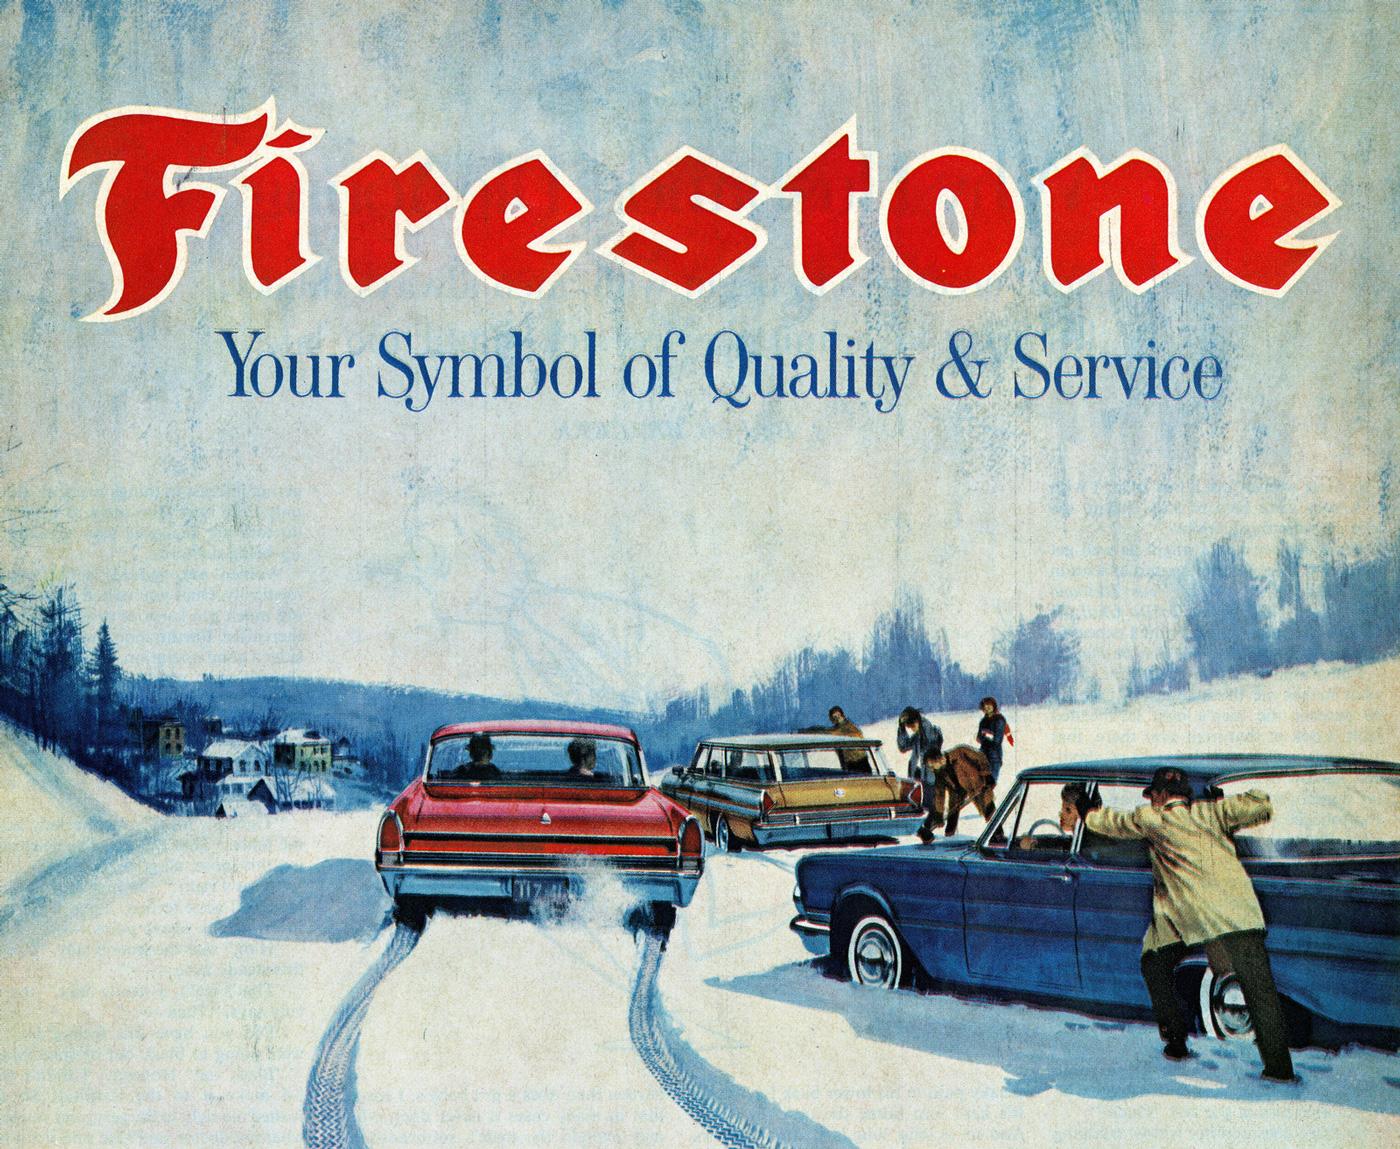 3 août 1900 – Fondation de la Firestone Tire & Rubber Company